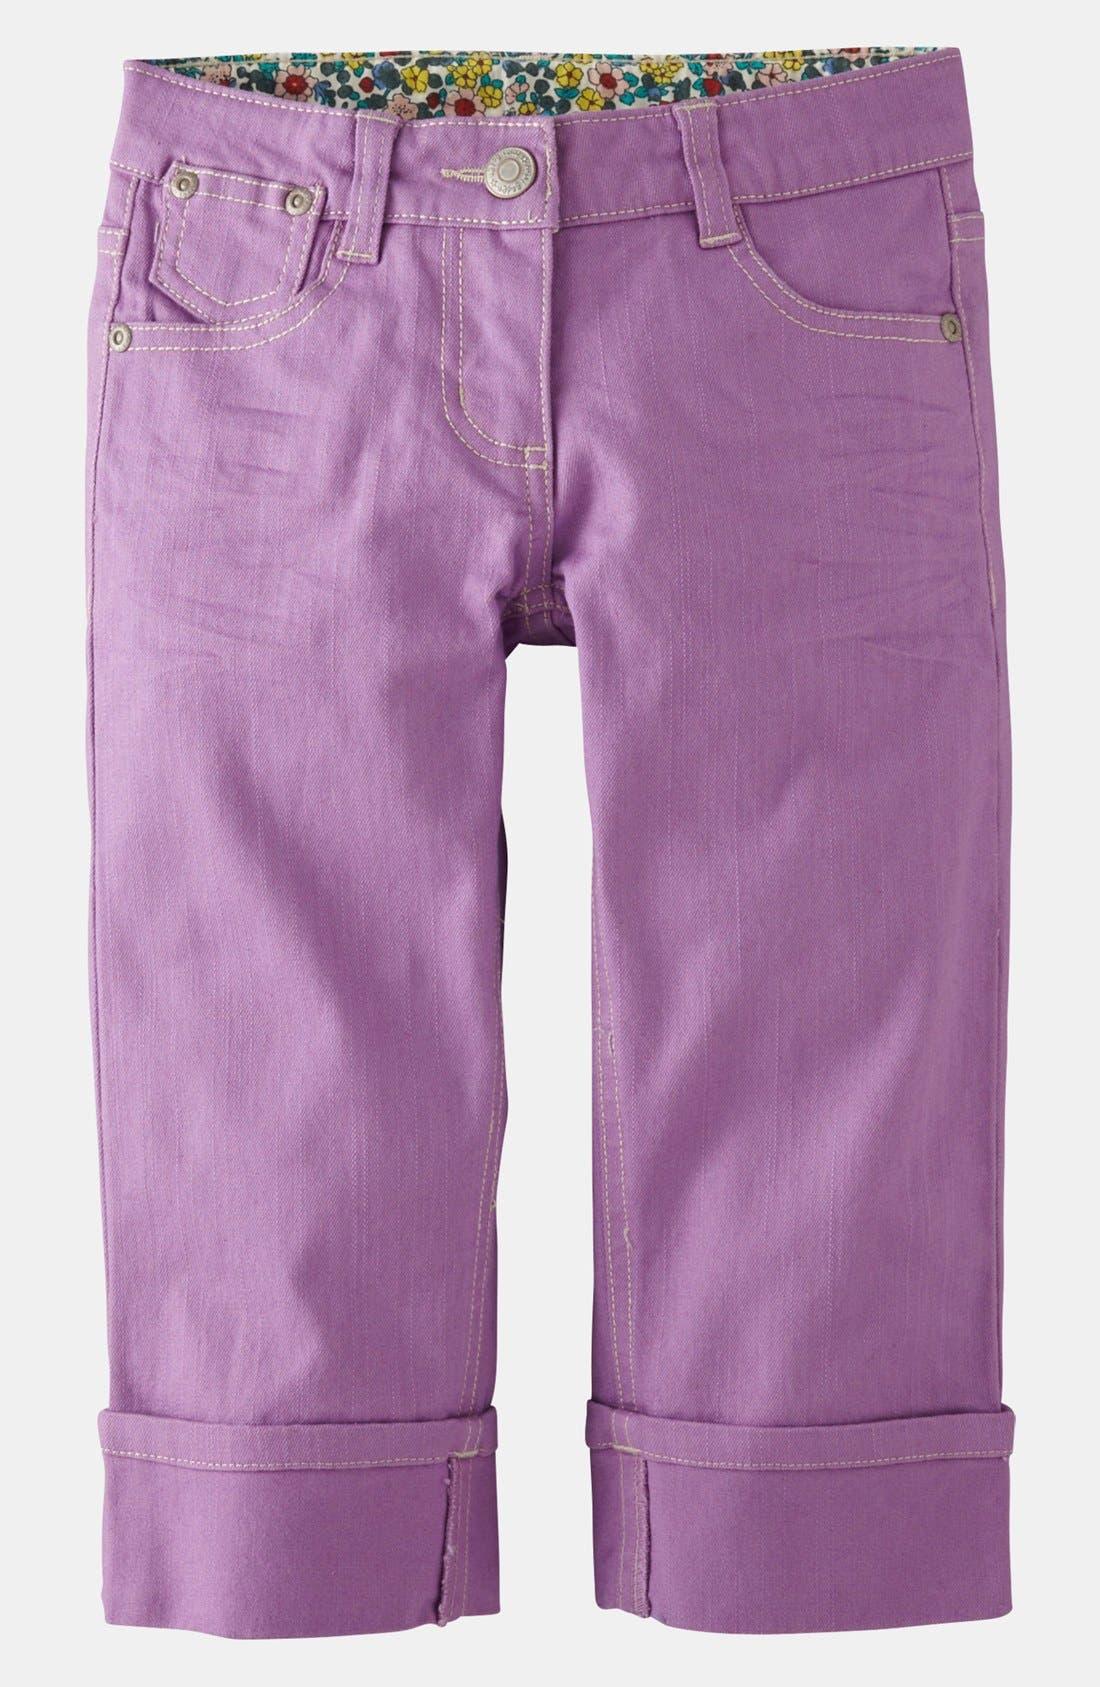 Main Image - Mini Boden Crop Jeans (Toddler, Little Girls & Big Girls)